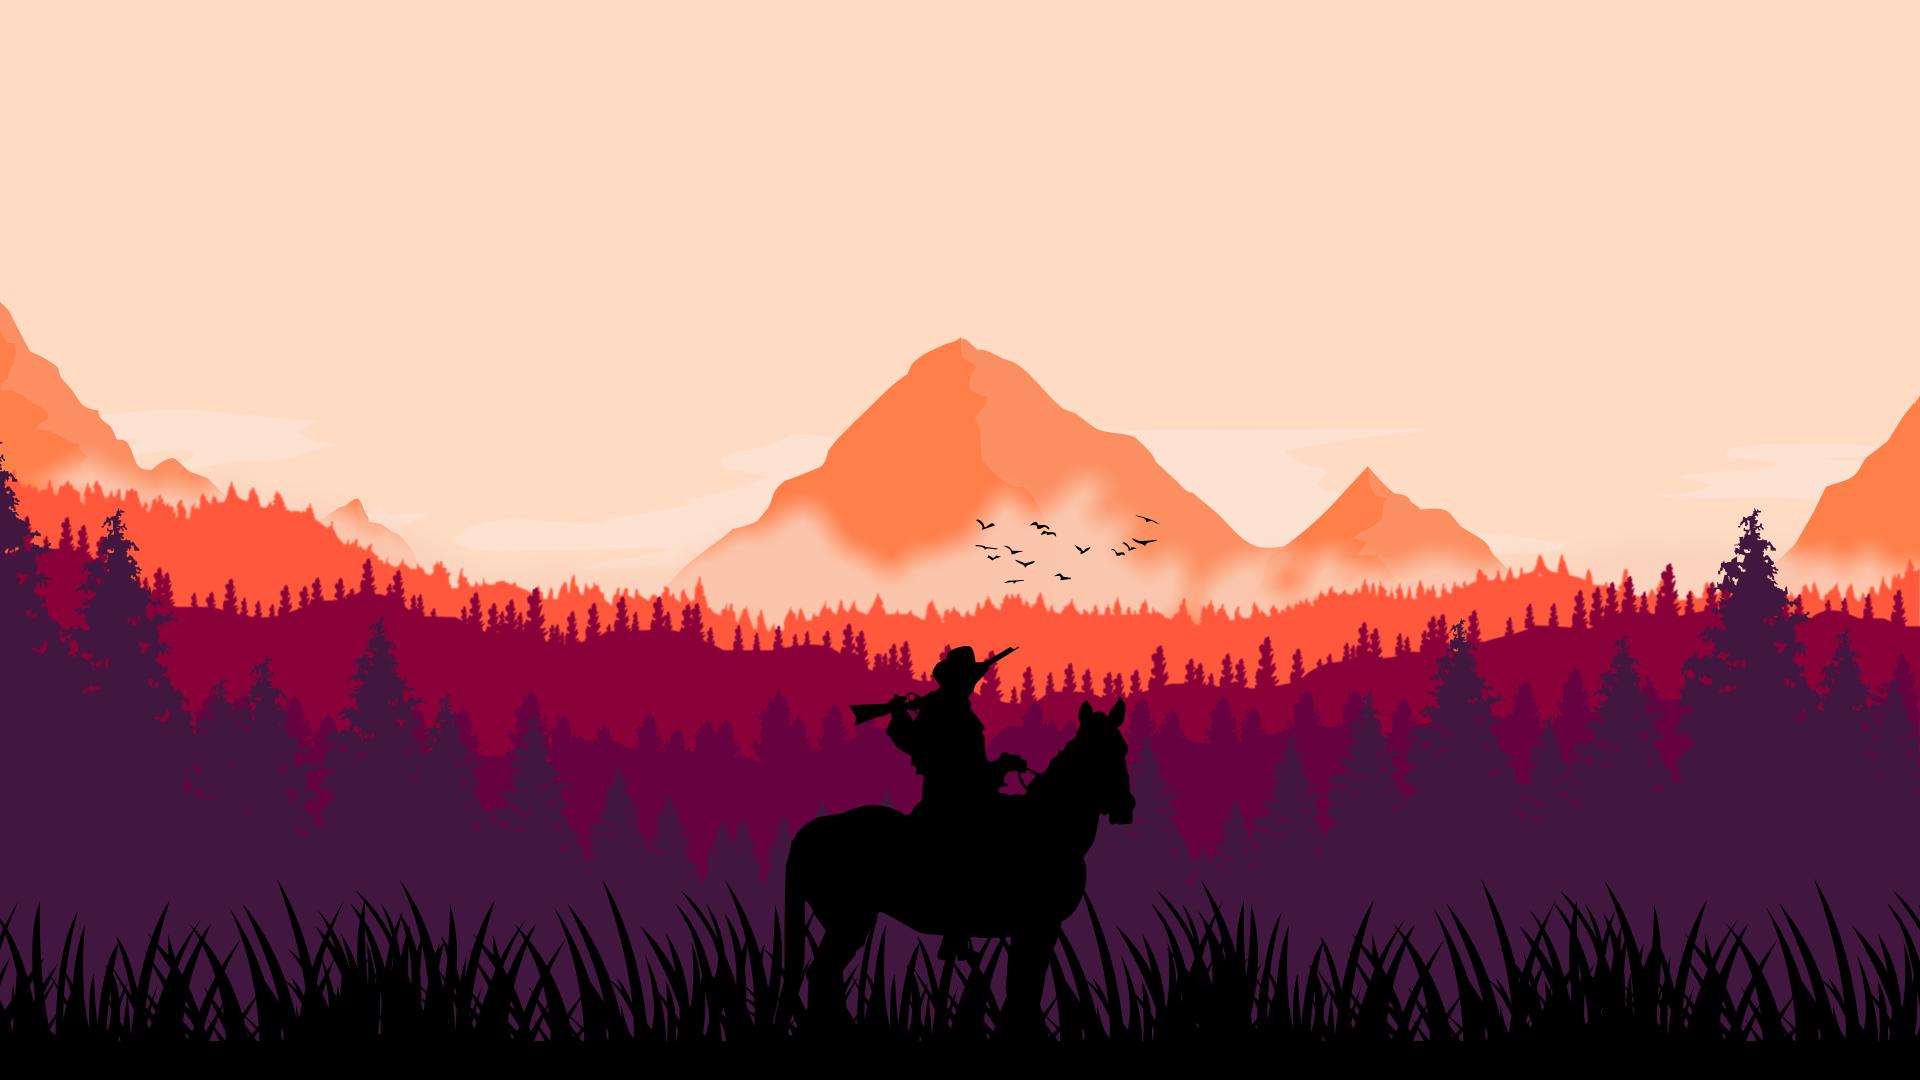 8K Western Wallpapers   Top 8K Western Backgrounds 1920x1080